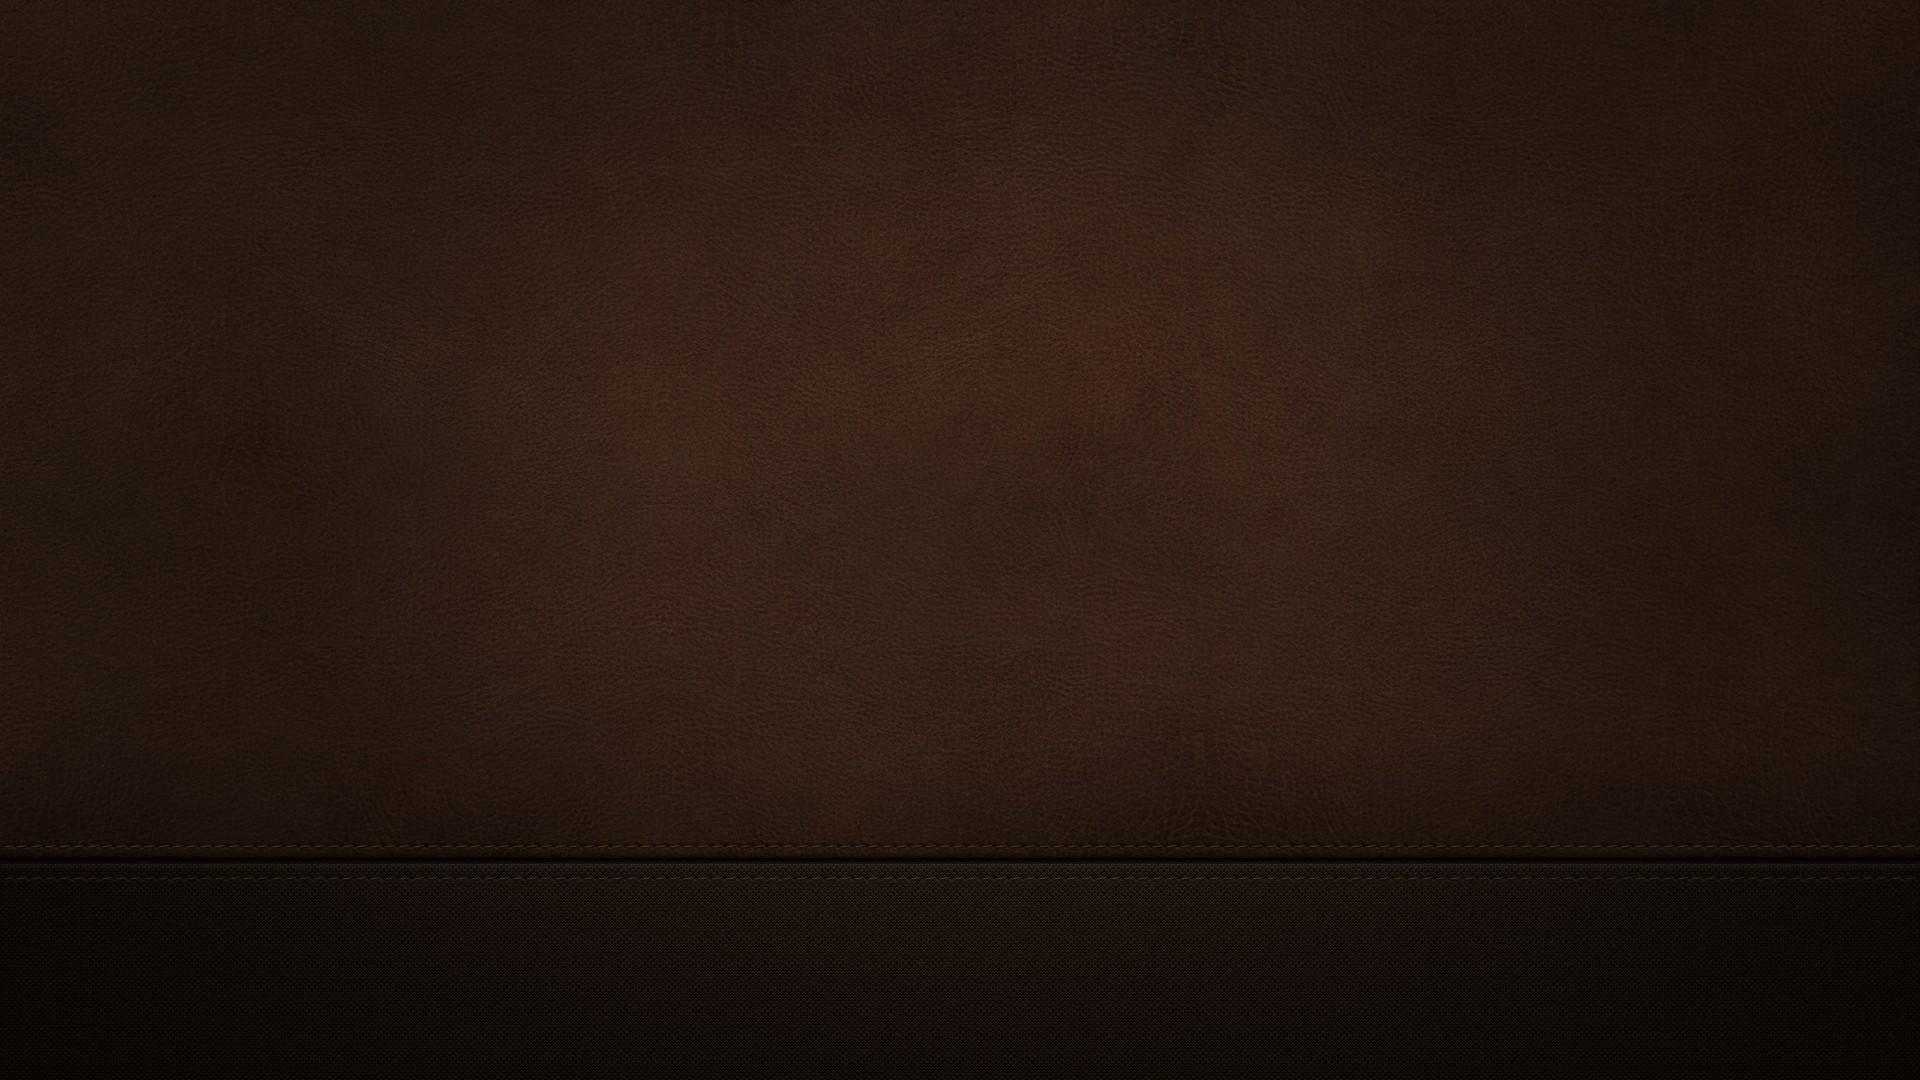 Brown Clean Wallpaper 19201080 Brown Clean 1920x1080